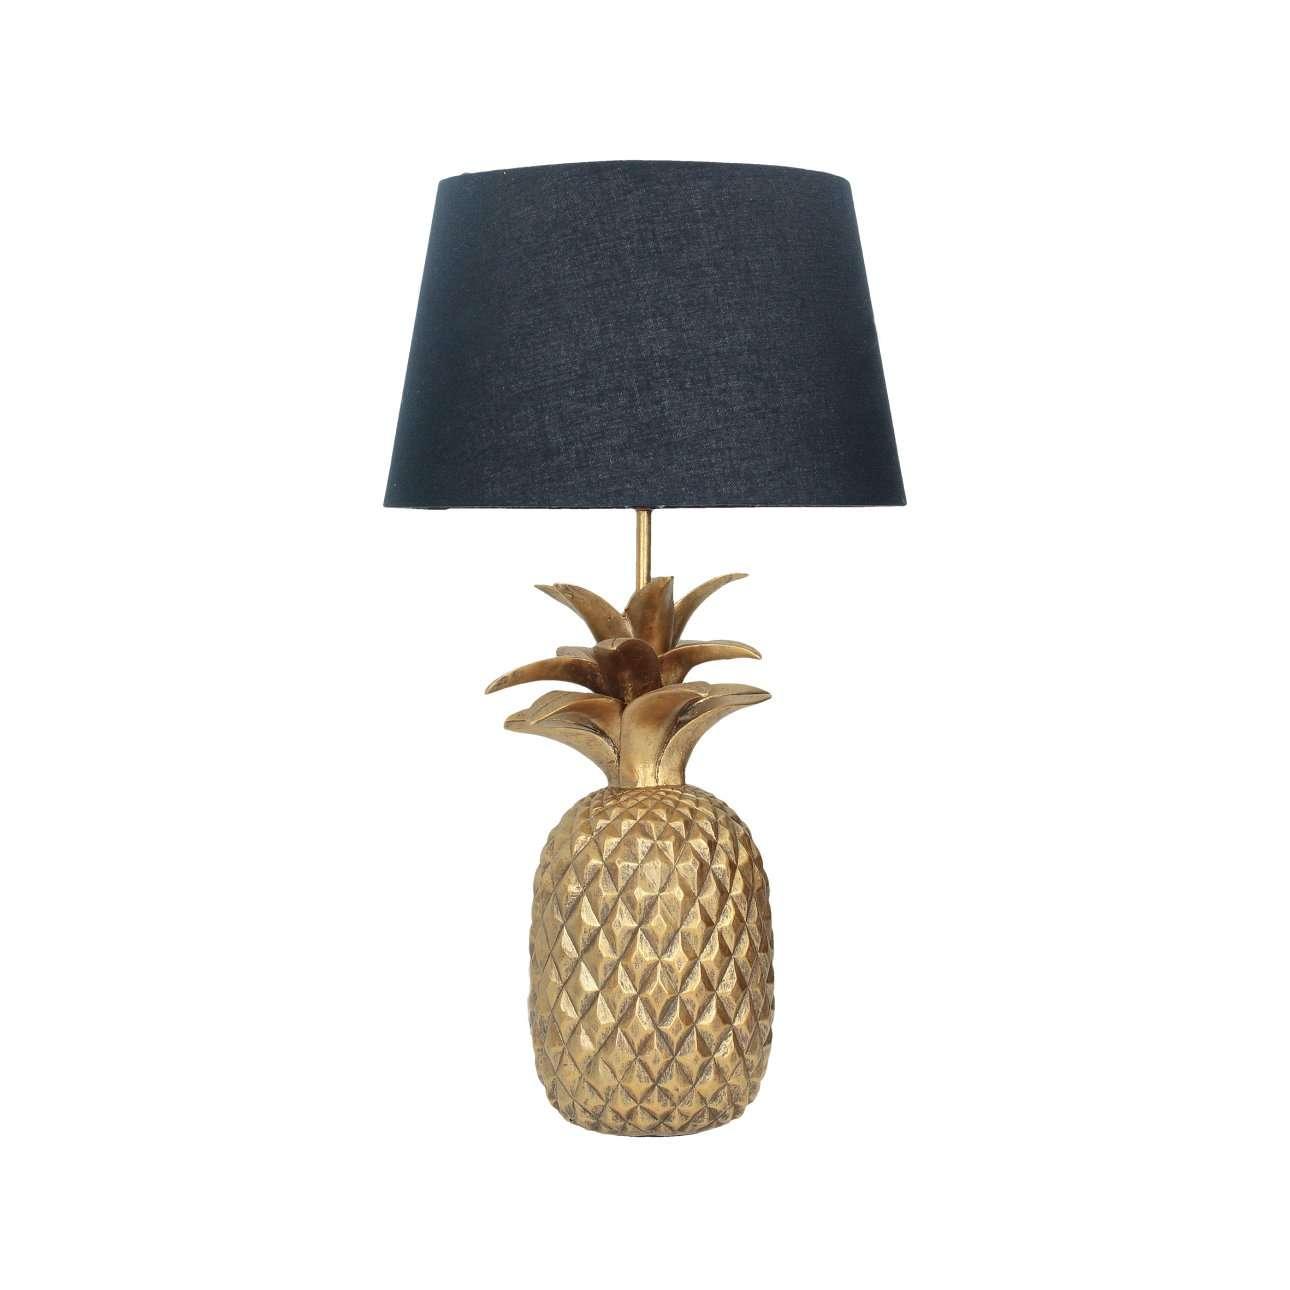 Tafellamp Pineapple gold 56cm